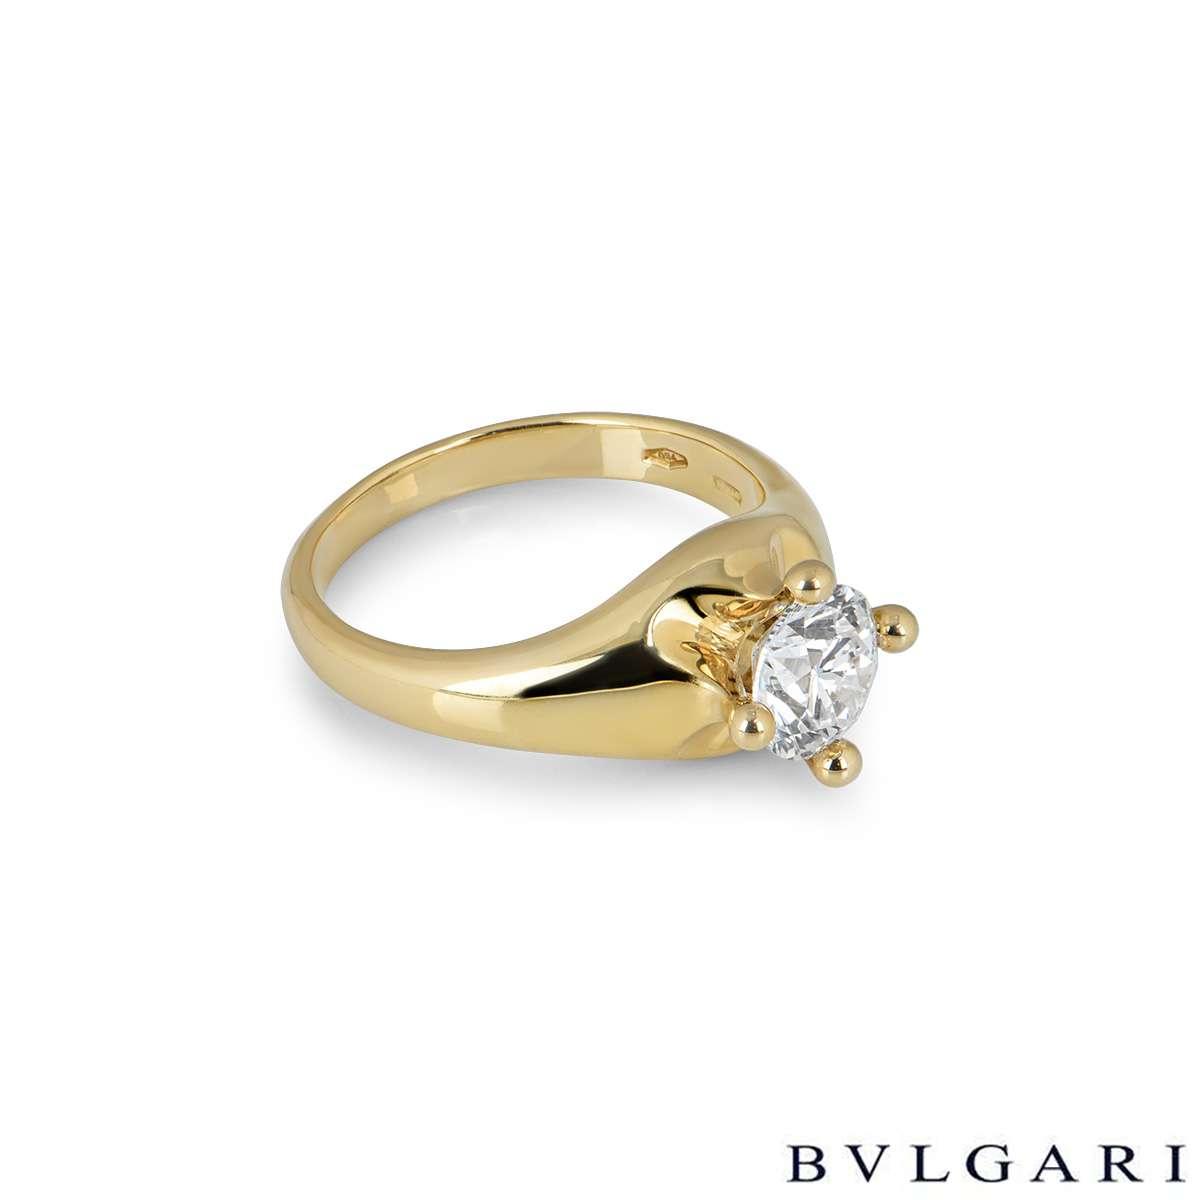 Bvlgari Corona Round Brilliant Cut Diamond Ring 1.01ct D/VVS1